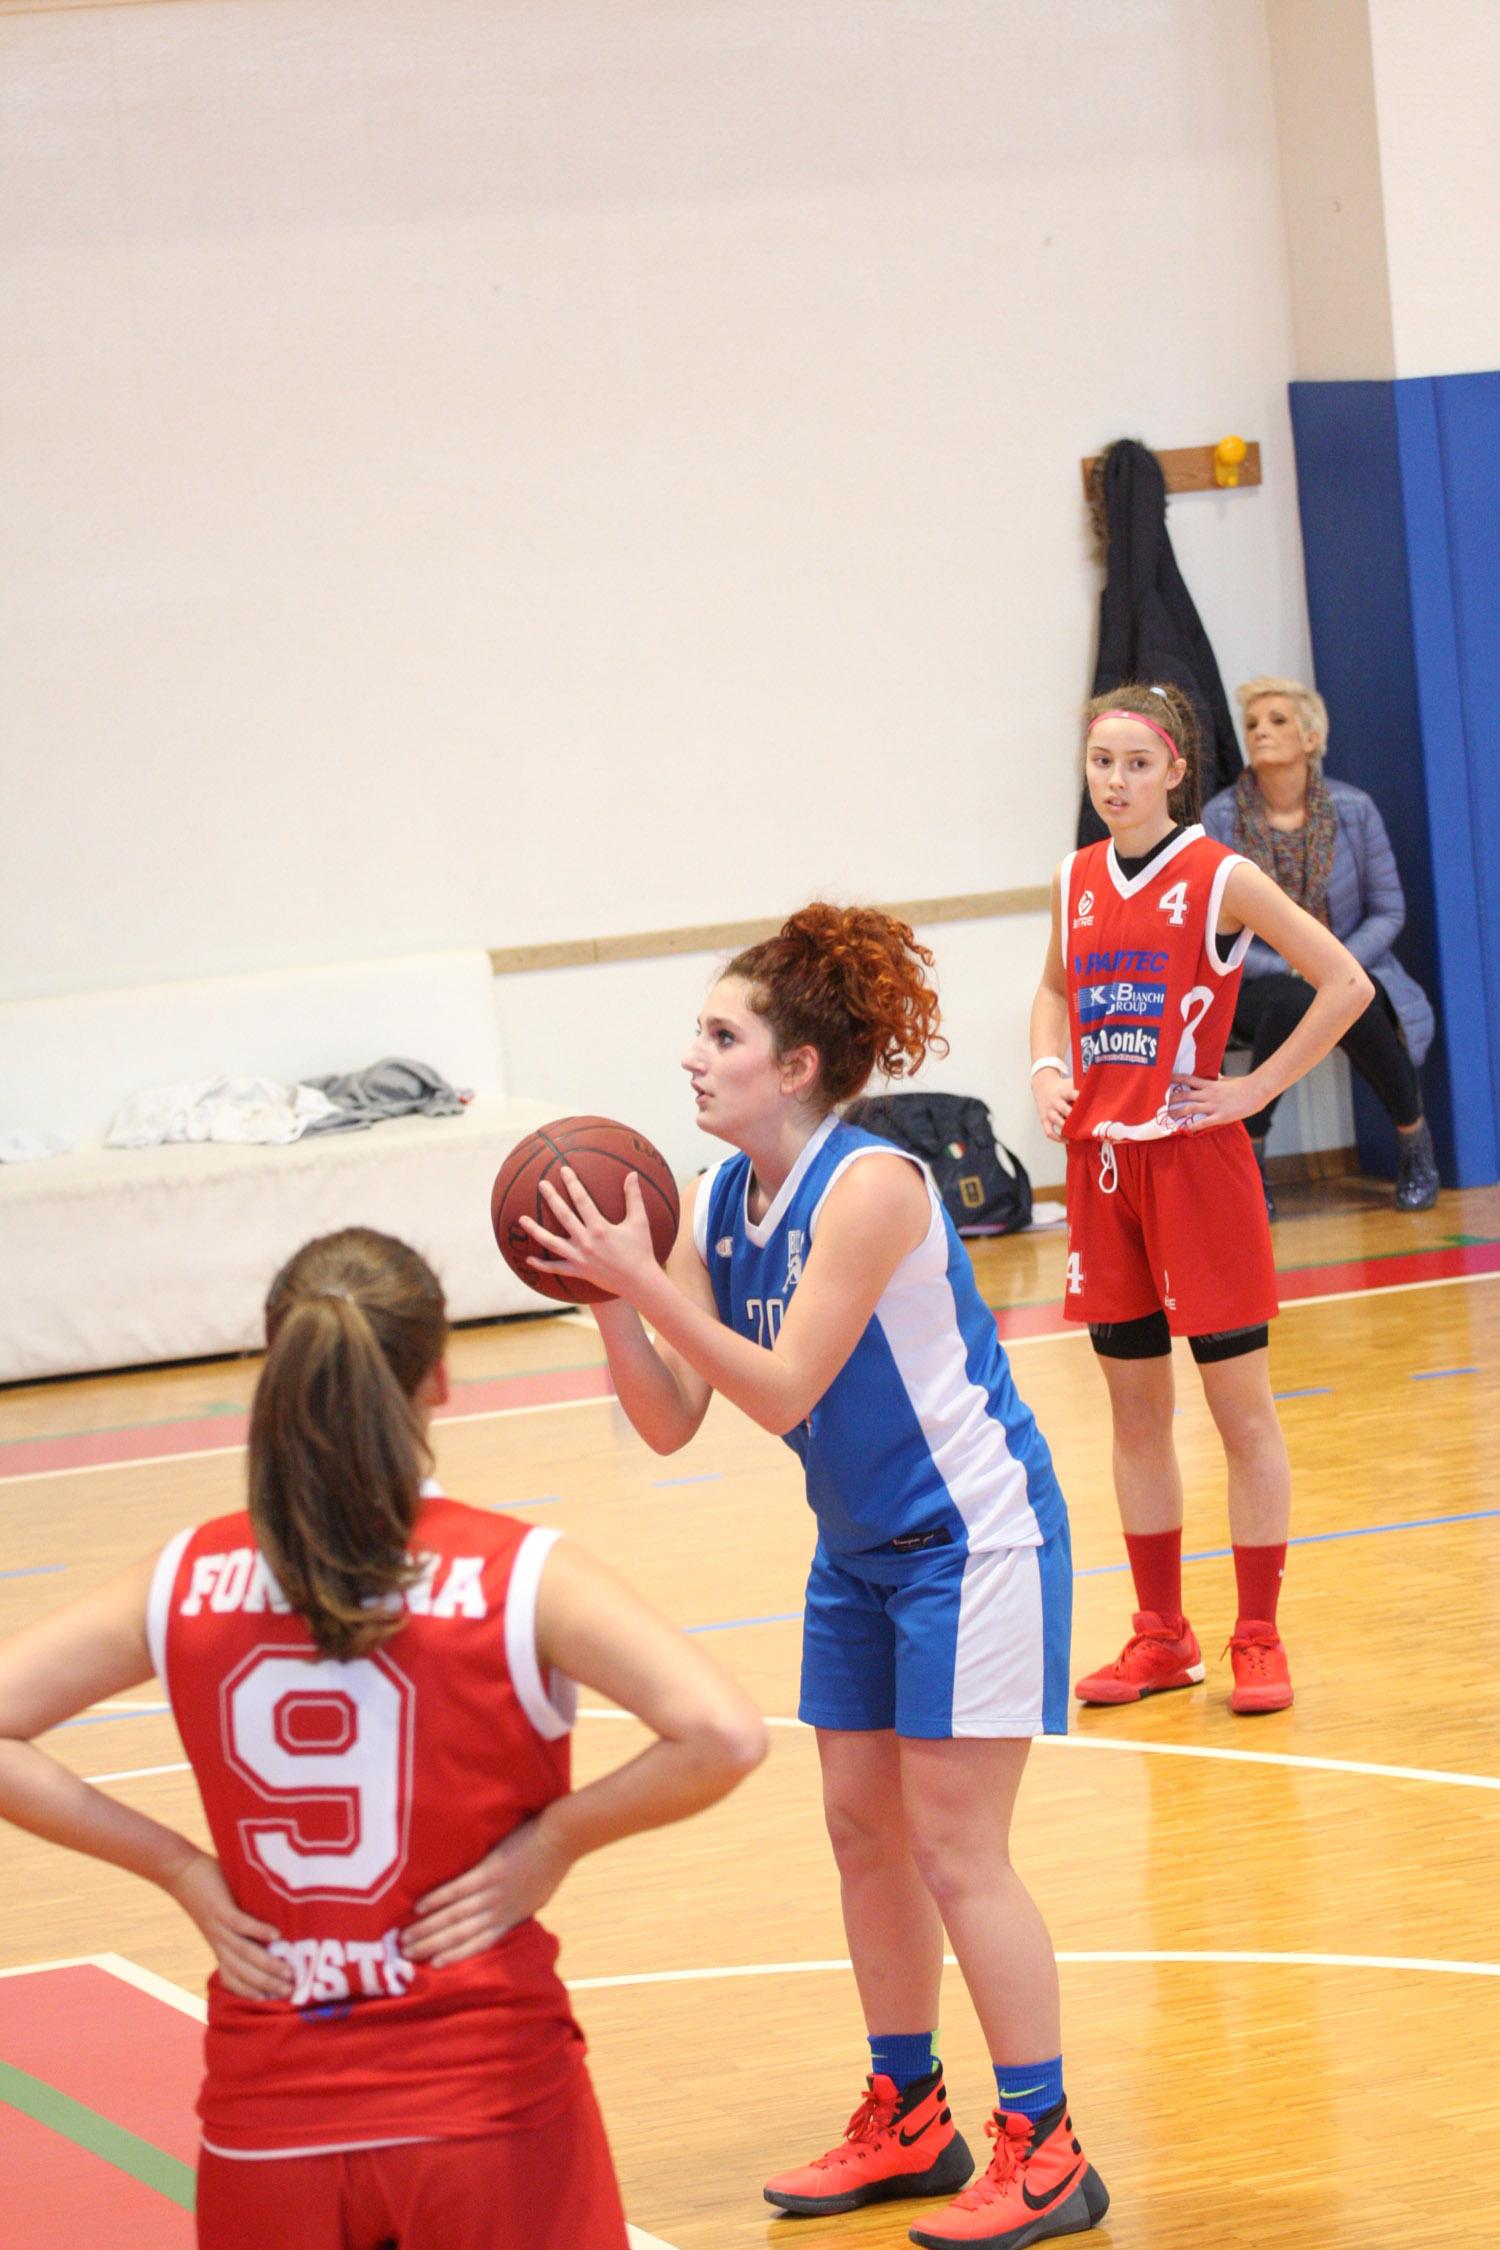 U16E - Costa Masnaga vs Baskettiamo Vittuone 2001 00020.jpg